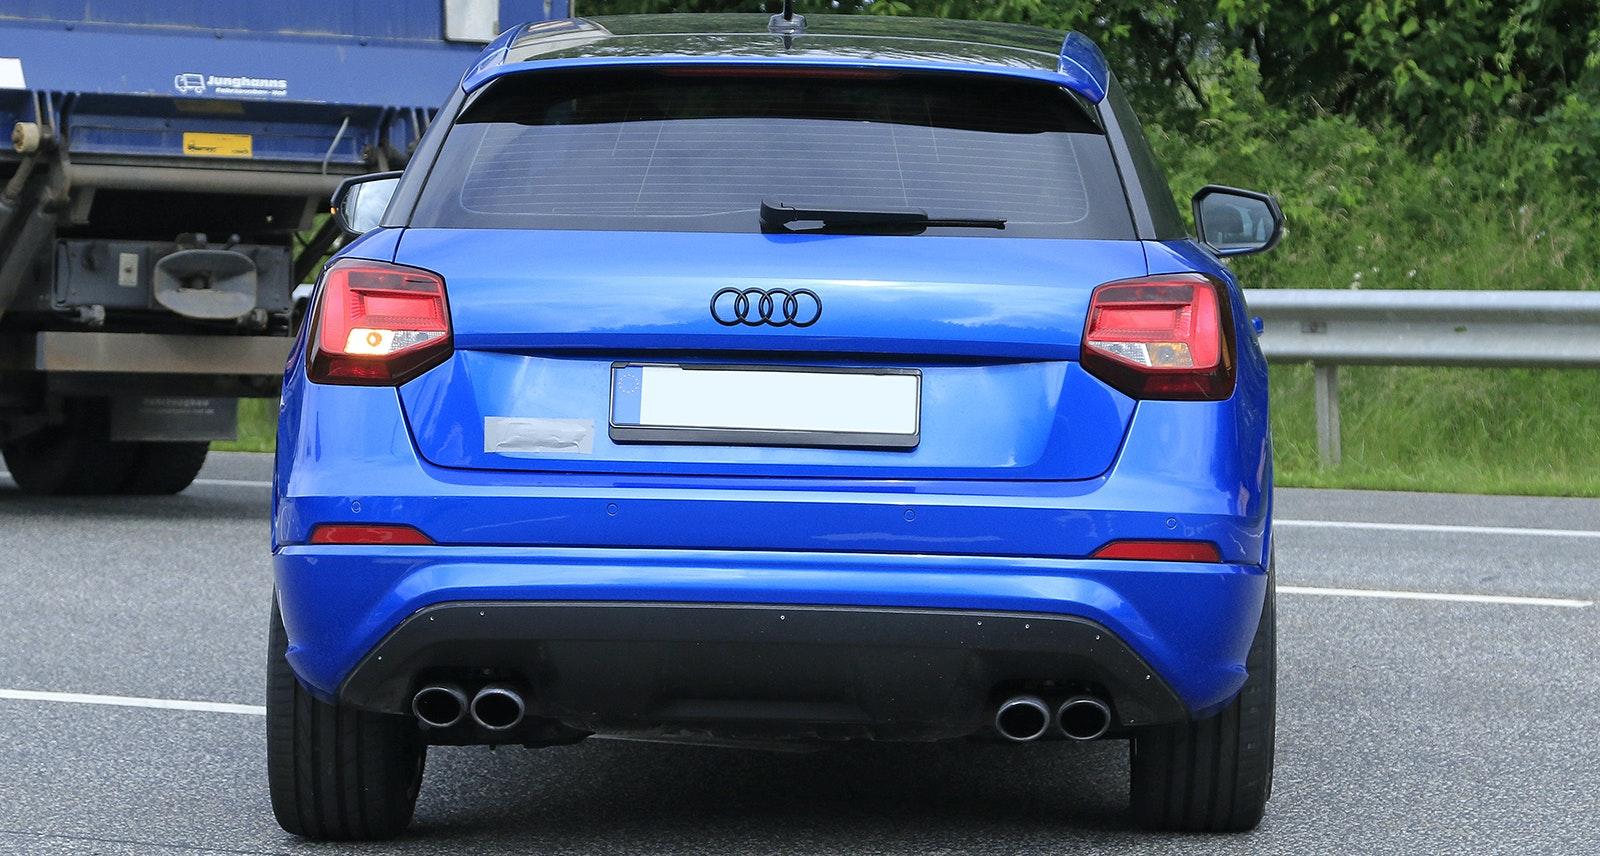 Audi Sq2 Release Date Uk >> 2018 Audi SQ2 price, specs and release date     carwow